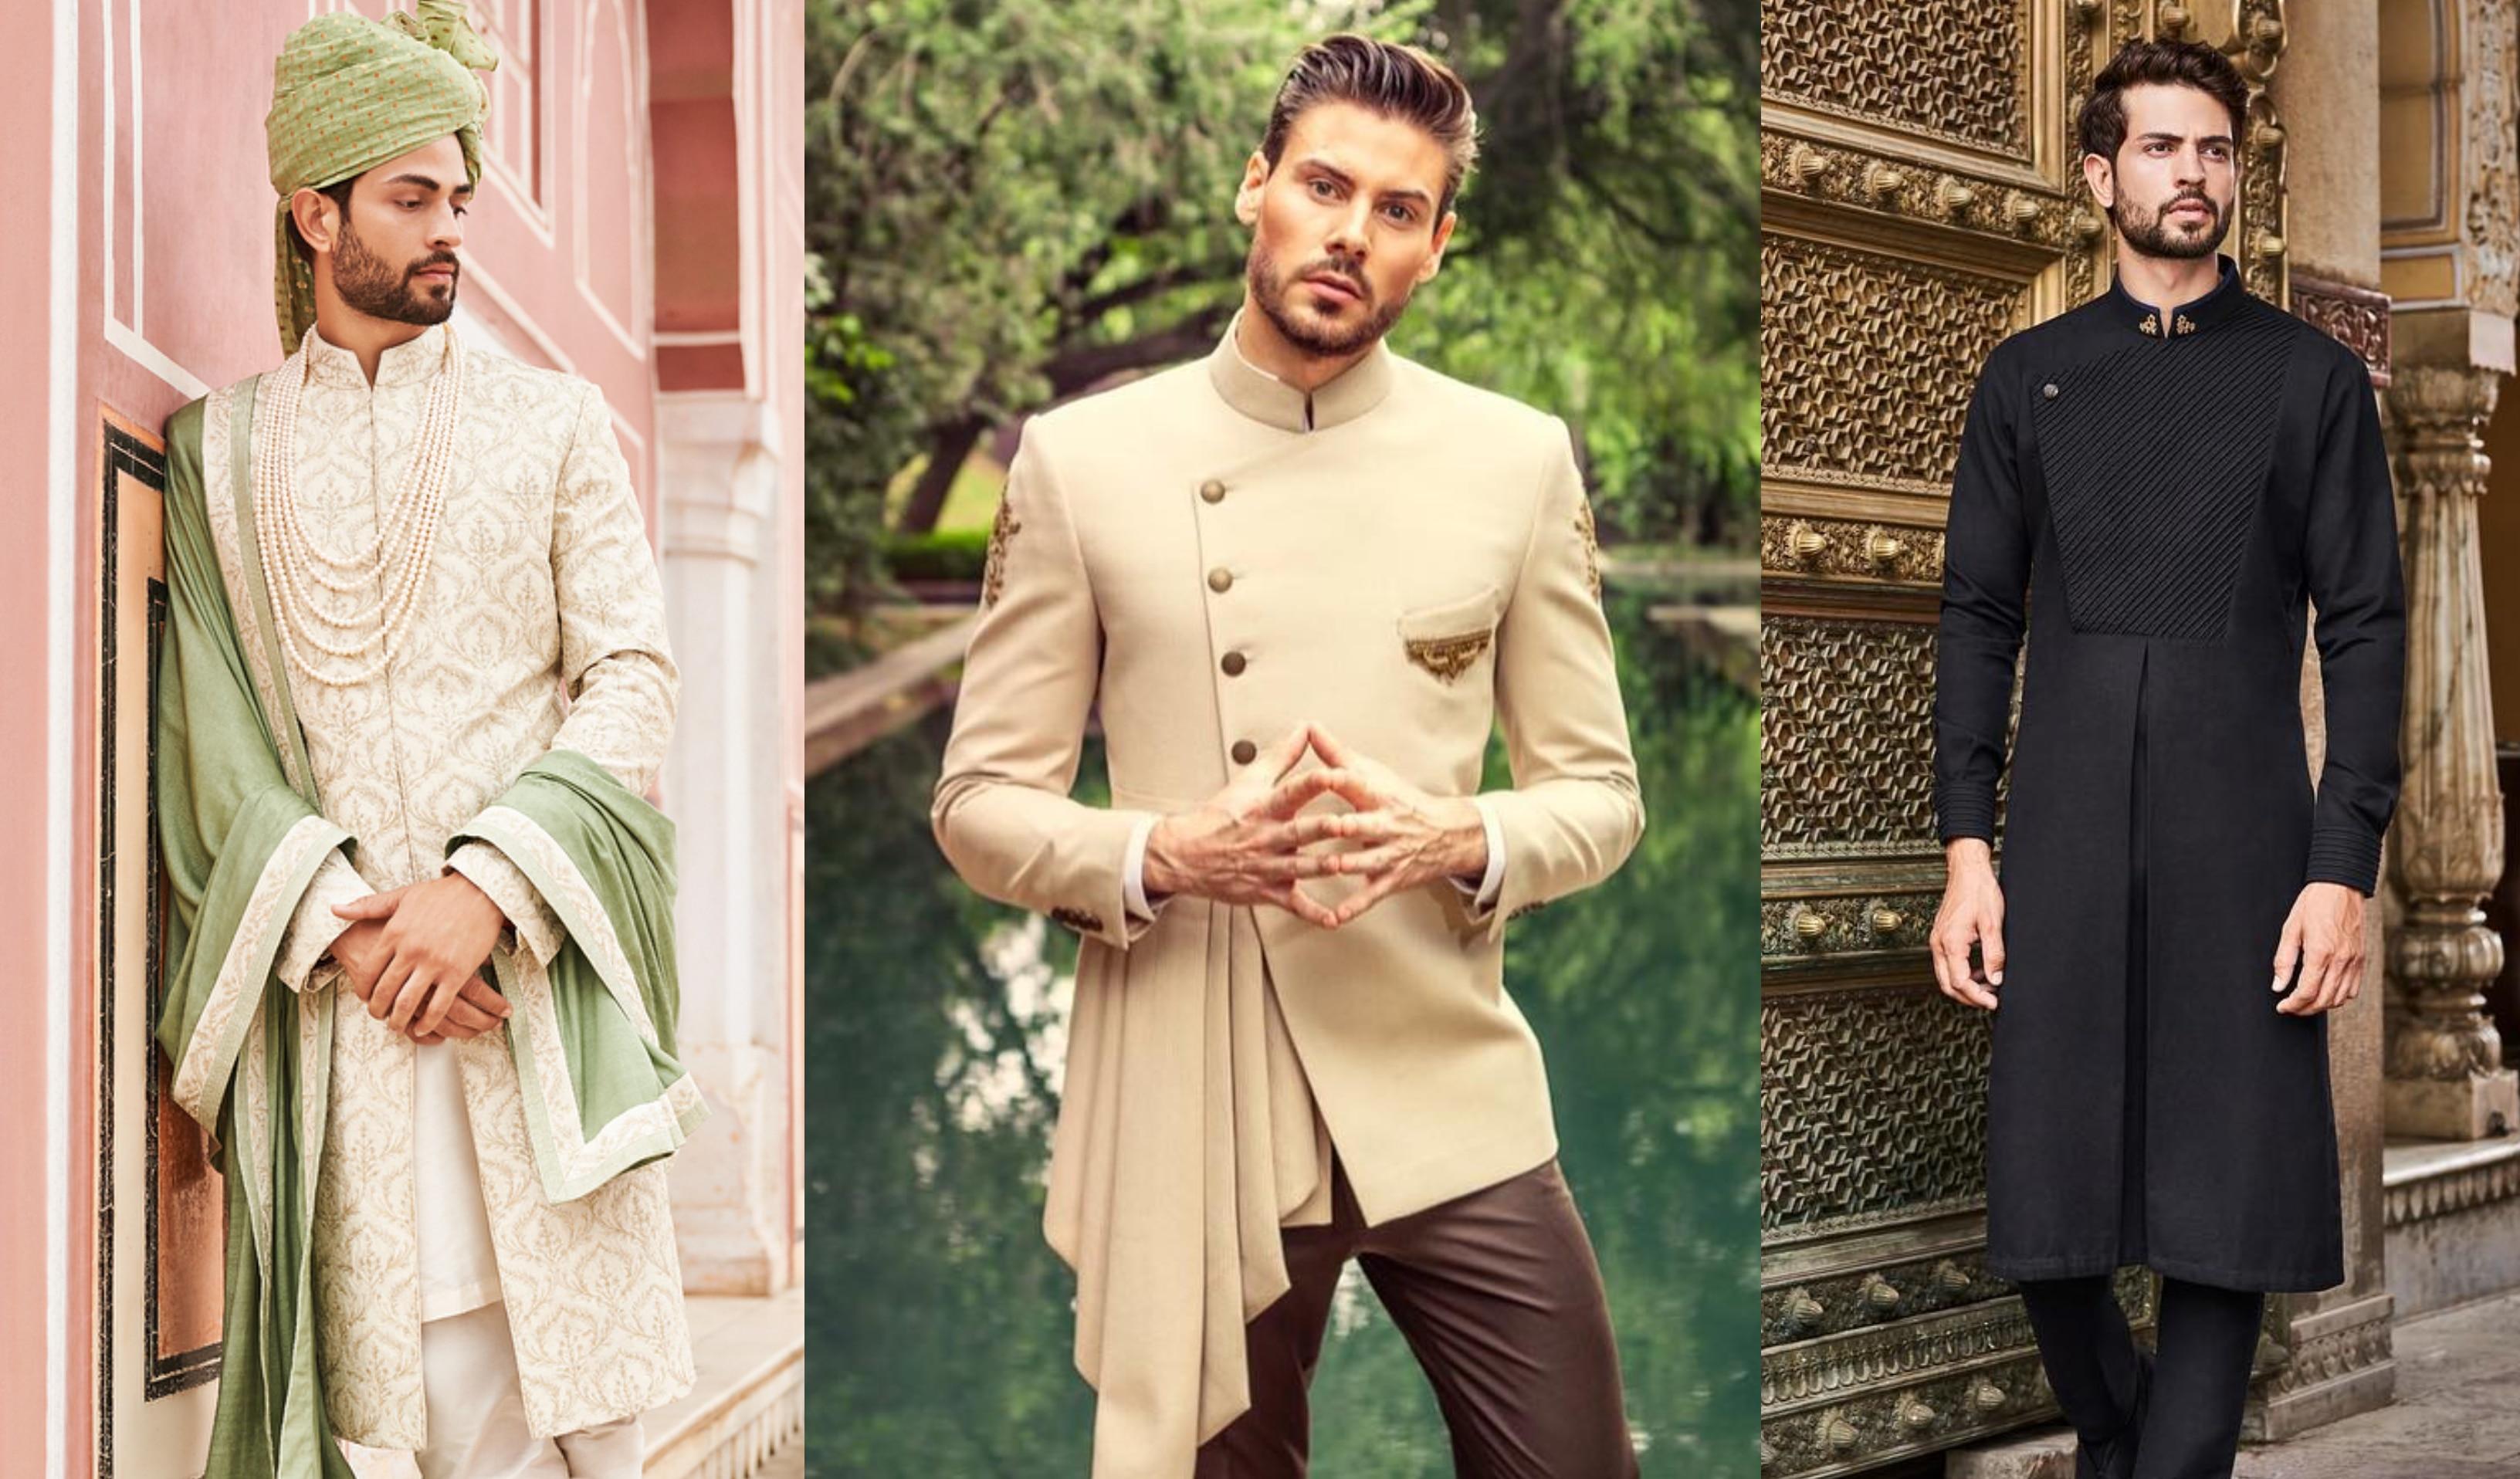 Leader of the Beauty Men Modern Fit 3-Piece Suit Blazer Tux Wedding Dress